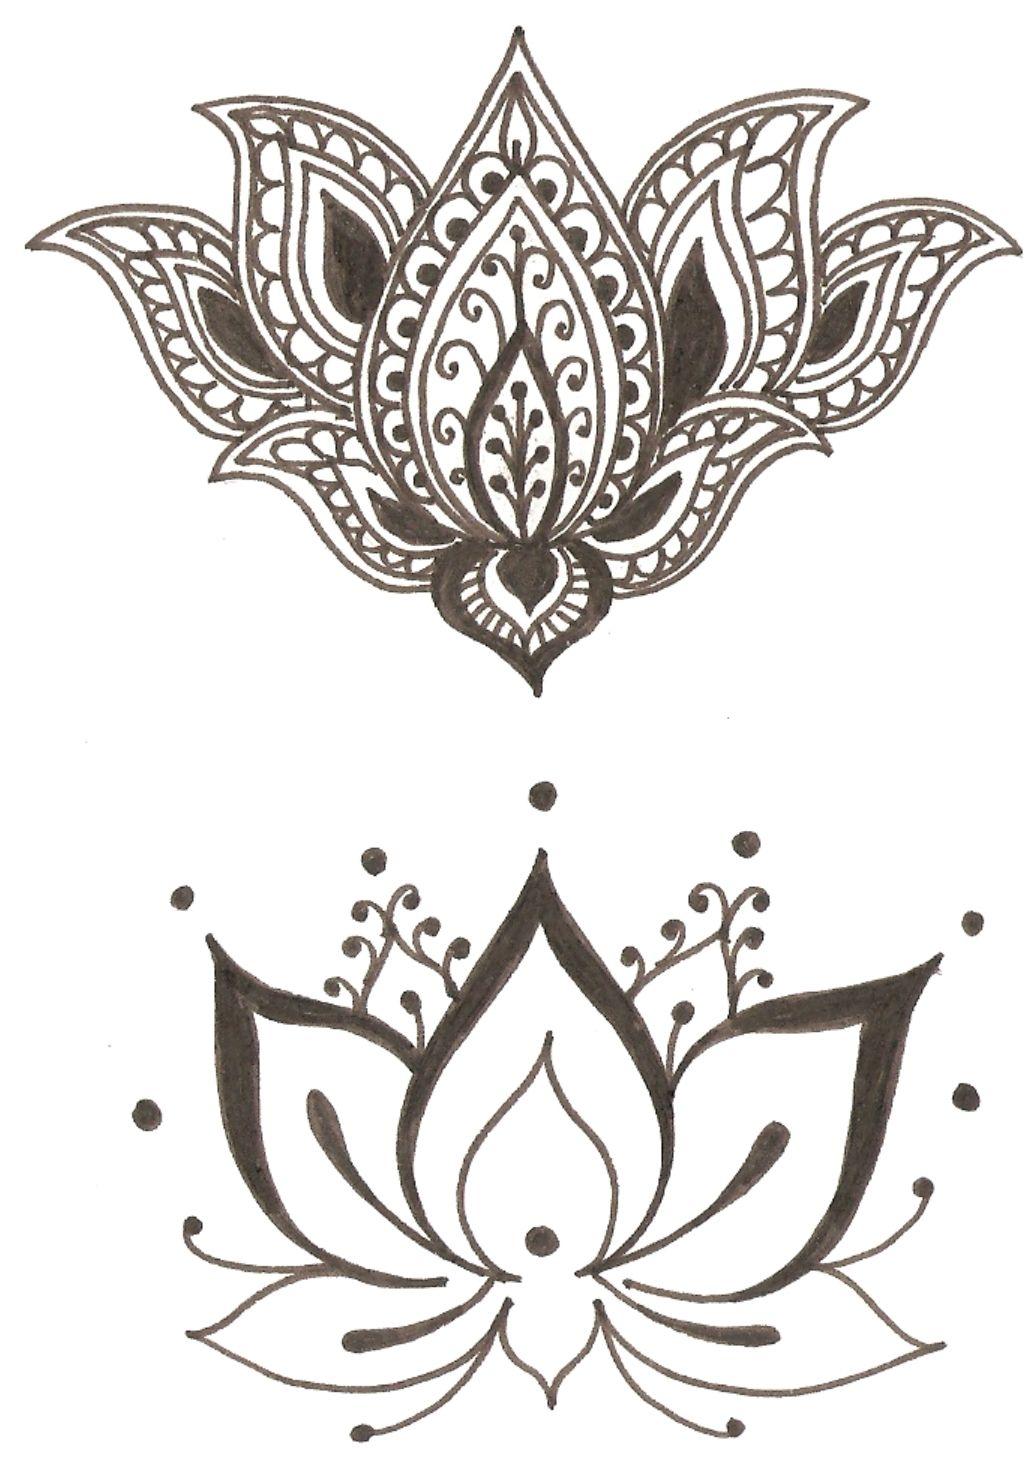 The bottom one for my sternum desen pinterest flower tattoos lotus flower symbol of spirituality beauty femininity purity love the lotus henna tattoos izmirmasajfo